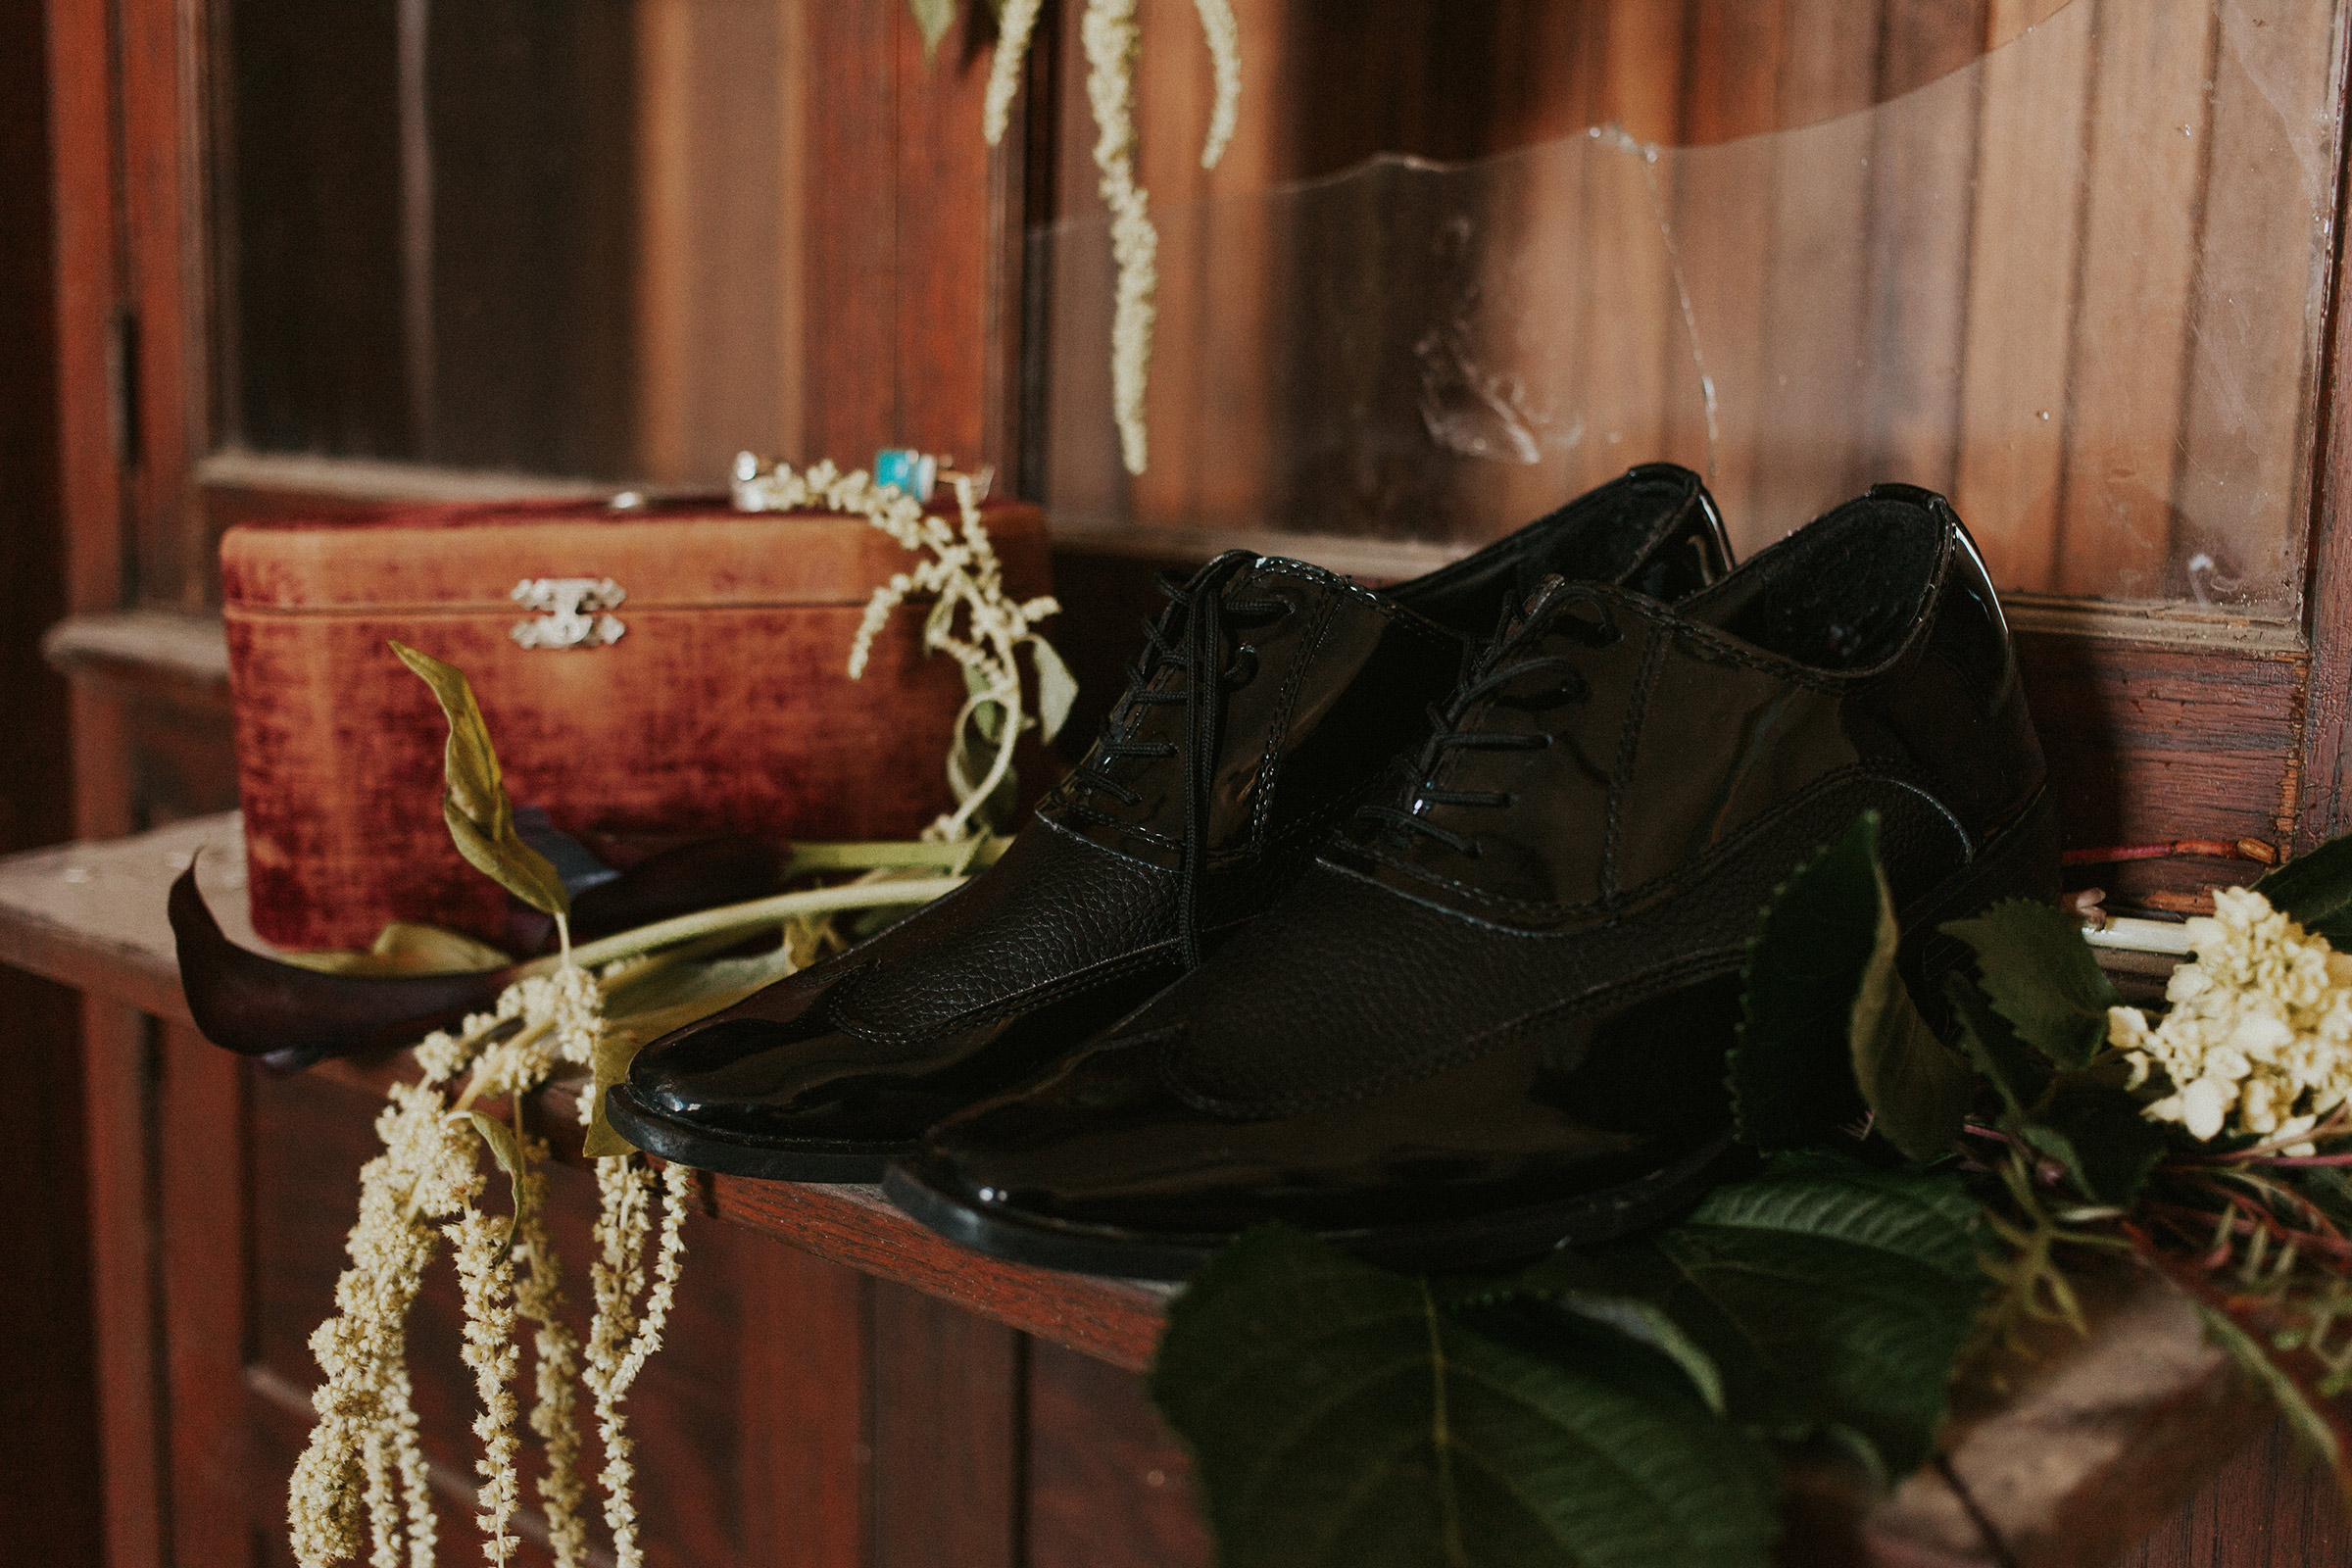 skeffingtons-dress-shoes-getting-ready-burlington-iowa-gothic-wedding-elopement-raelyn-ramey-photography-79.jpg